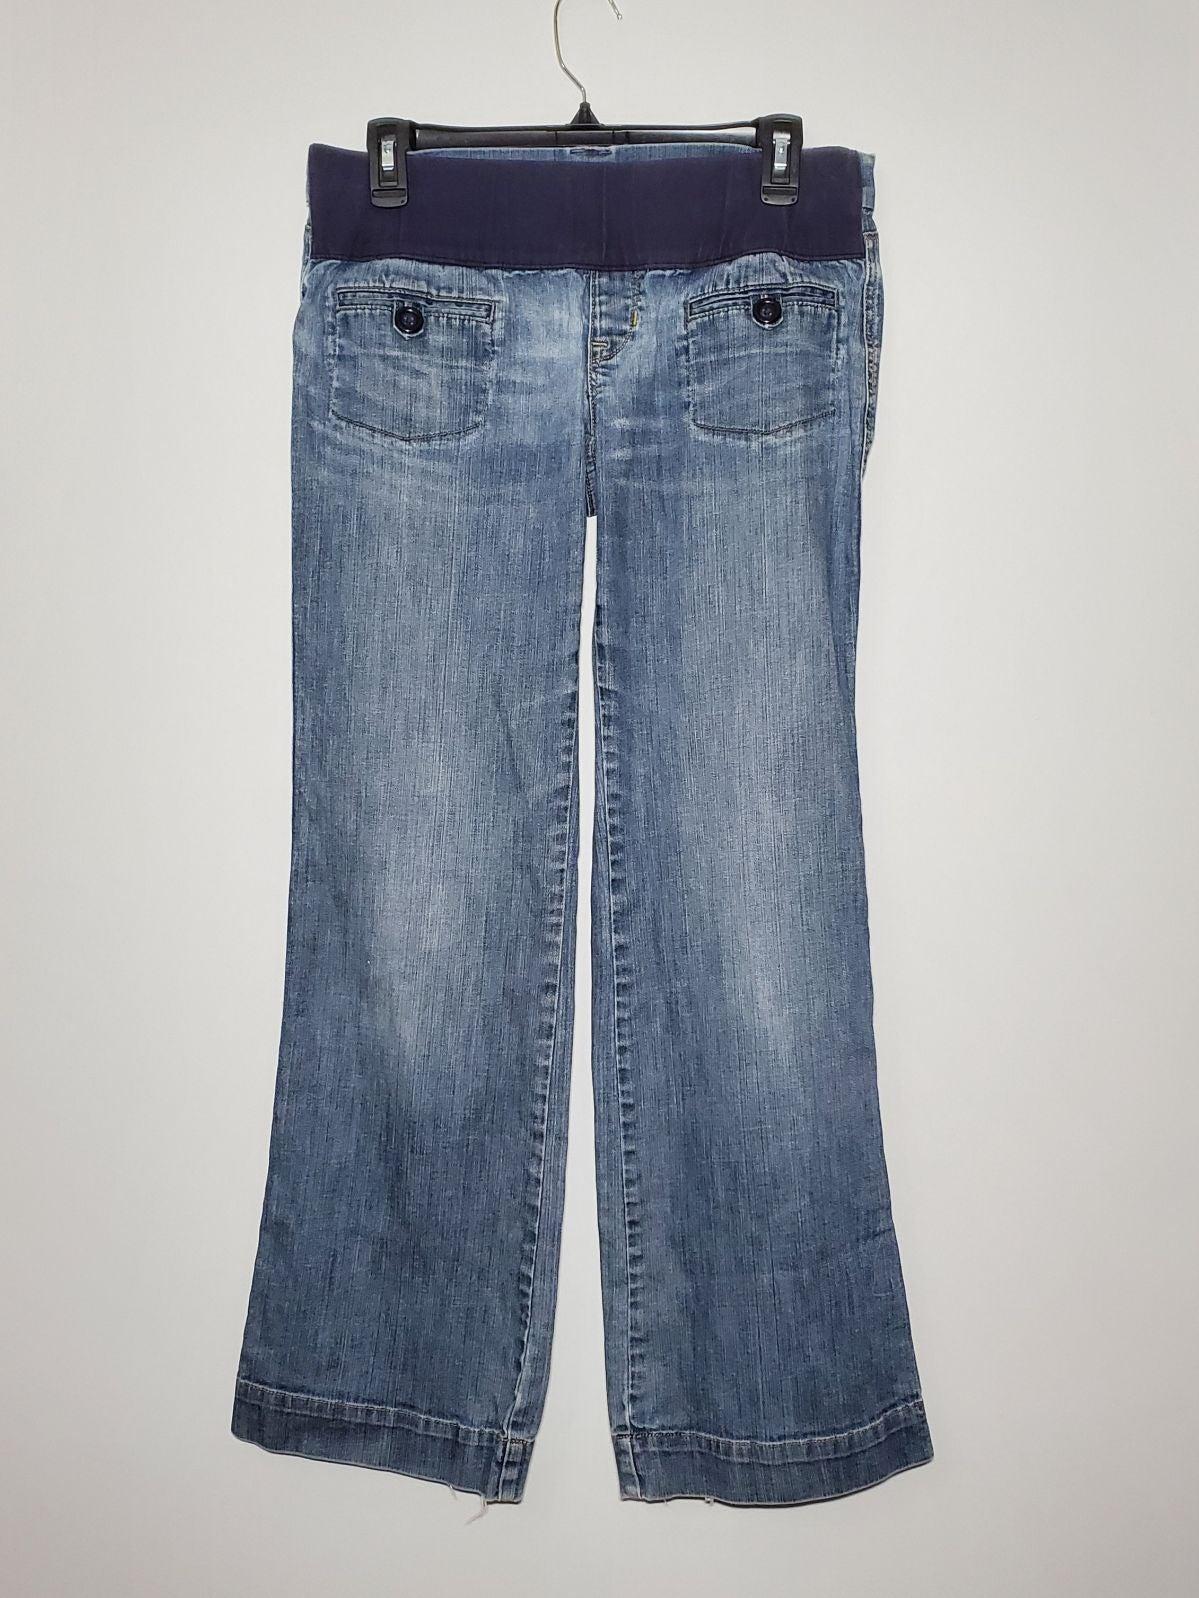 Gap Maternity Jeans Size 2